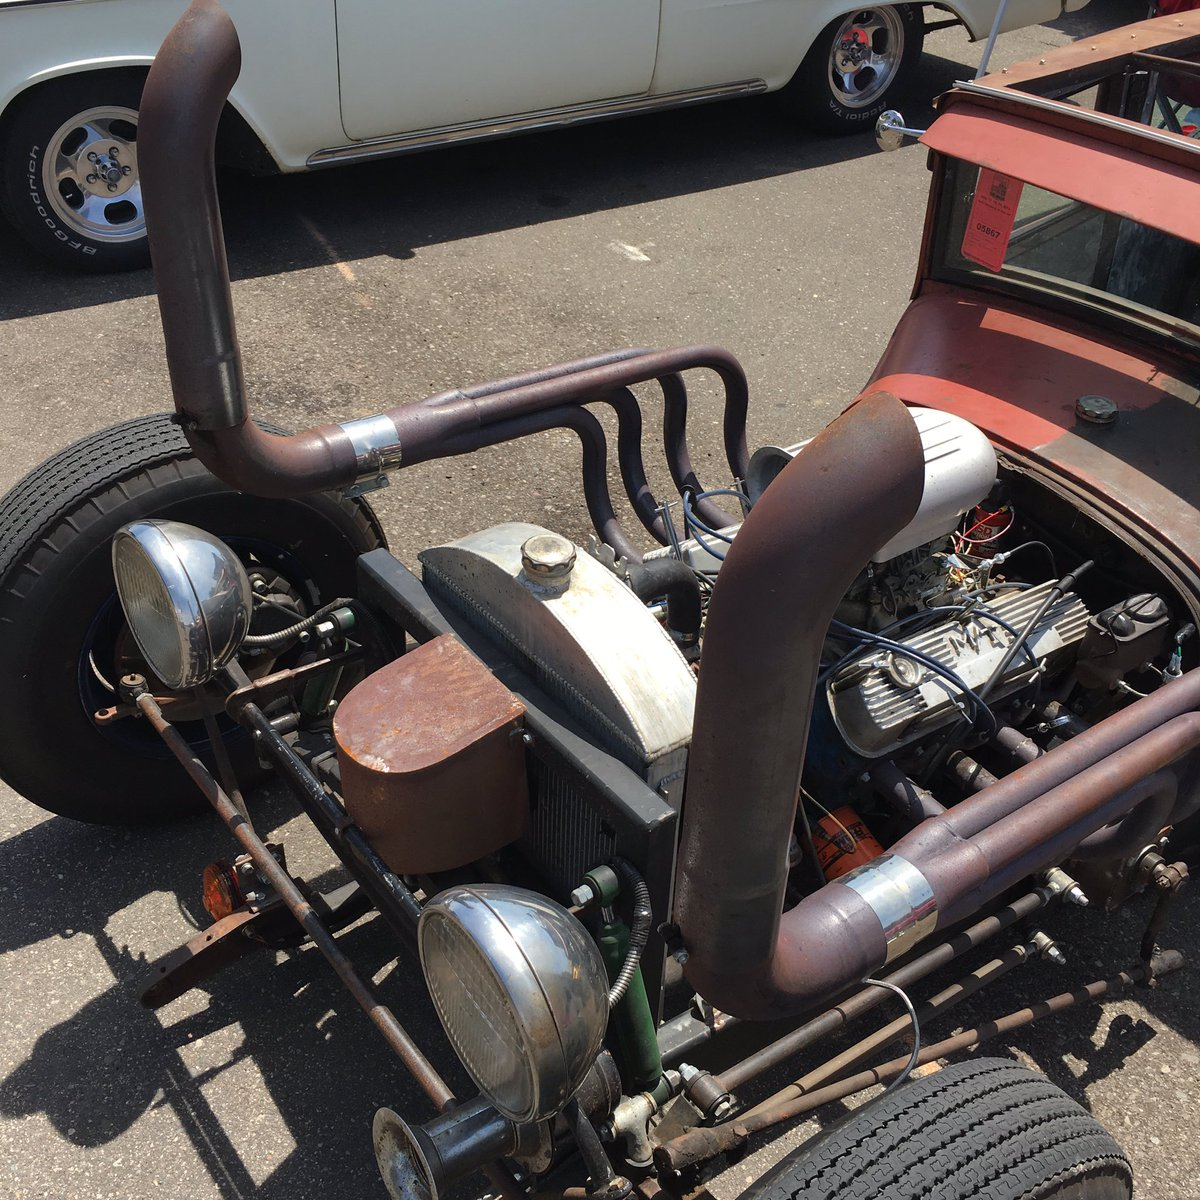 Mnpctech On Twitter Rat Rod With Wicked Exhaust Vintage Race Car 2016 Btt50s Hotrod Streetrod Stpaul Minnesota Hotrodmagazine